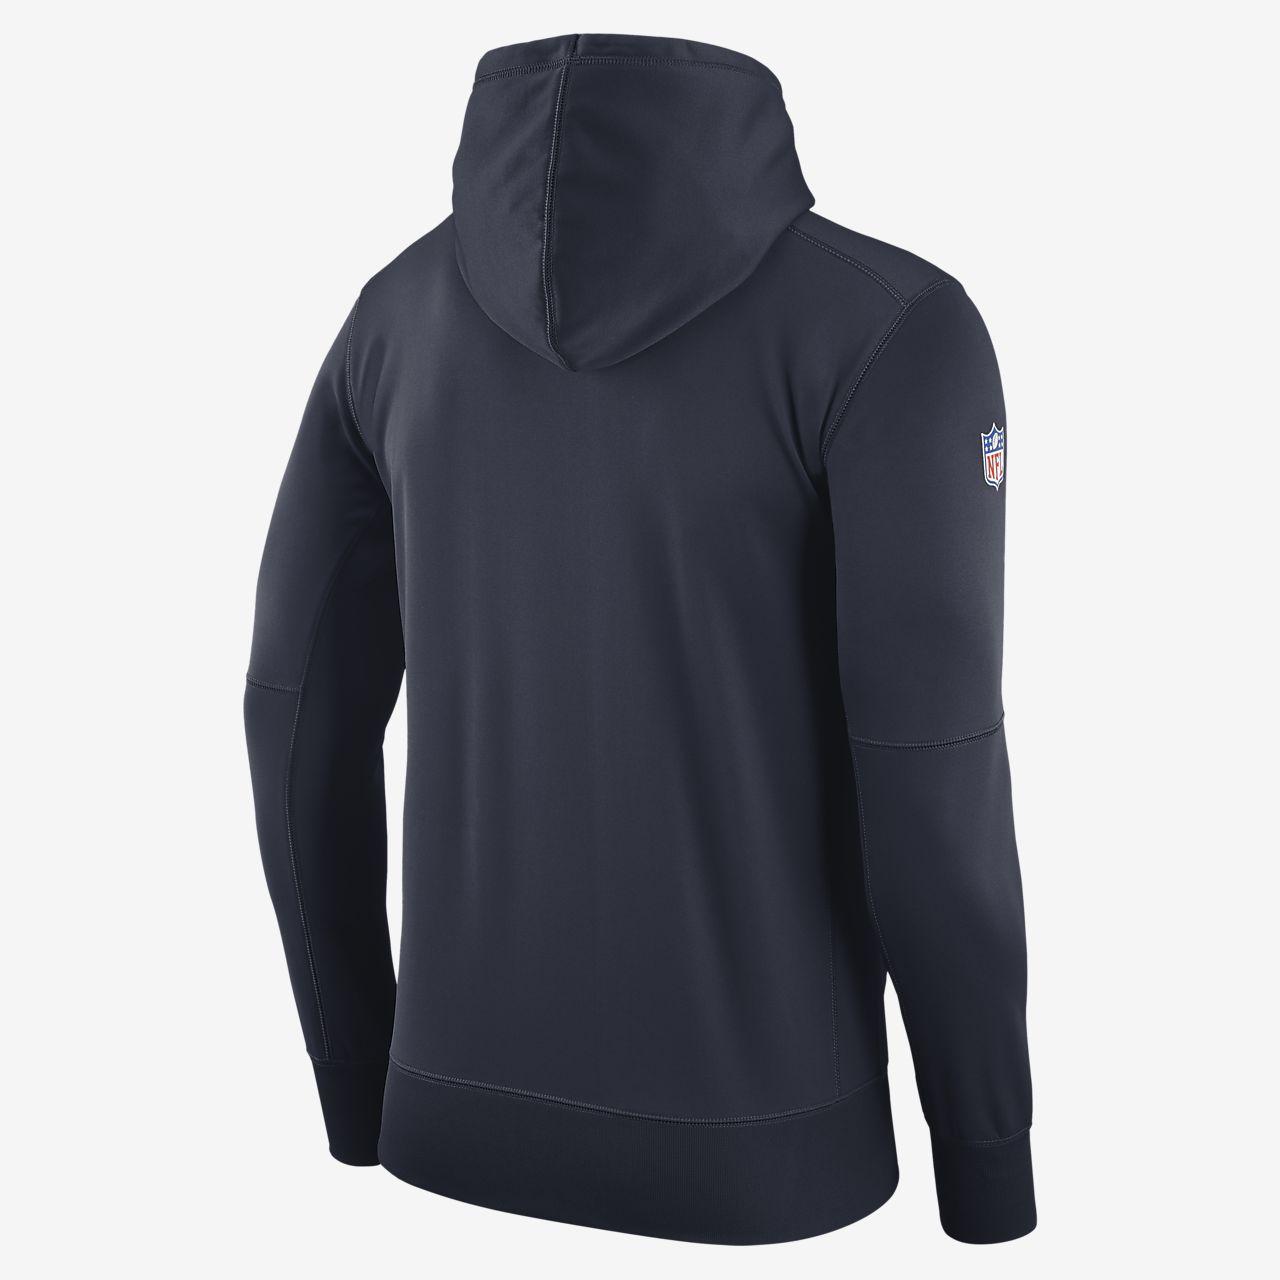 Felpa con cappuccio pullover Nike Fly Fleece (NFL Giants) Uomo